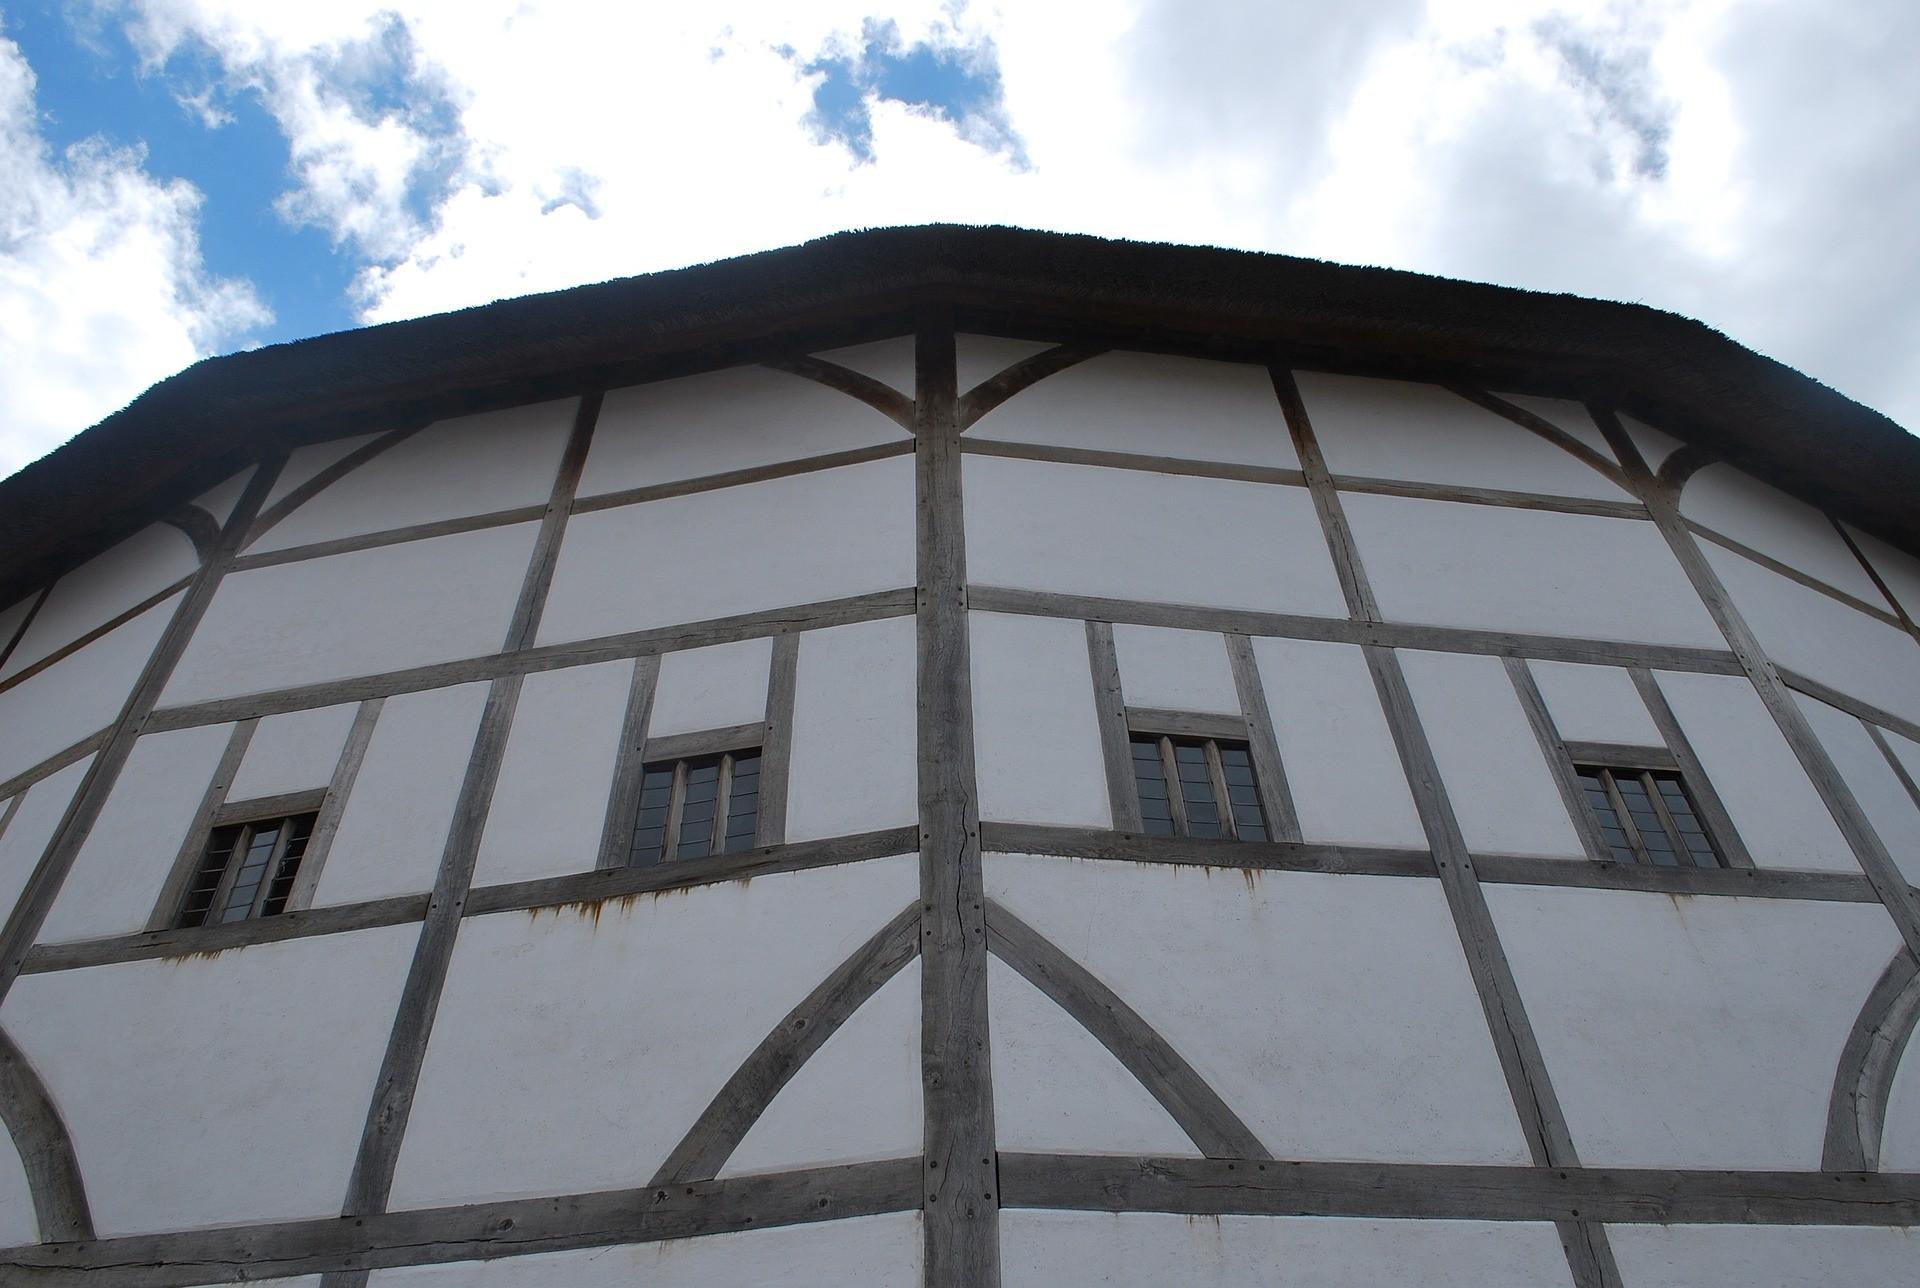 Shakespeare's Globe, London: All year